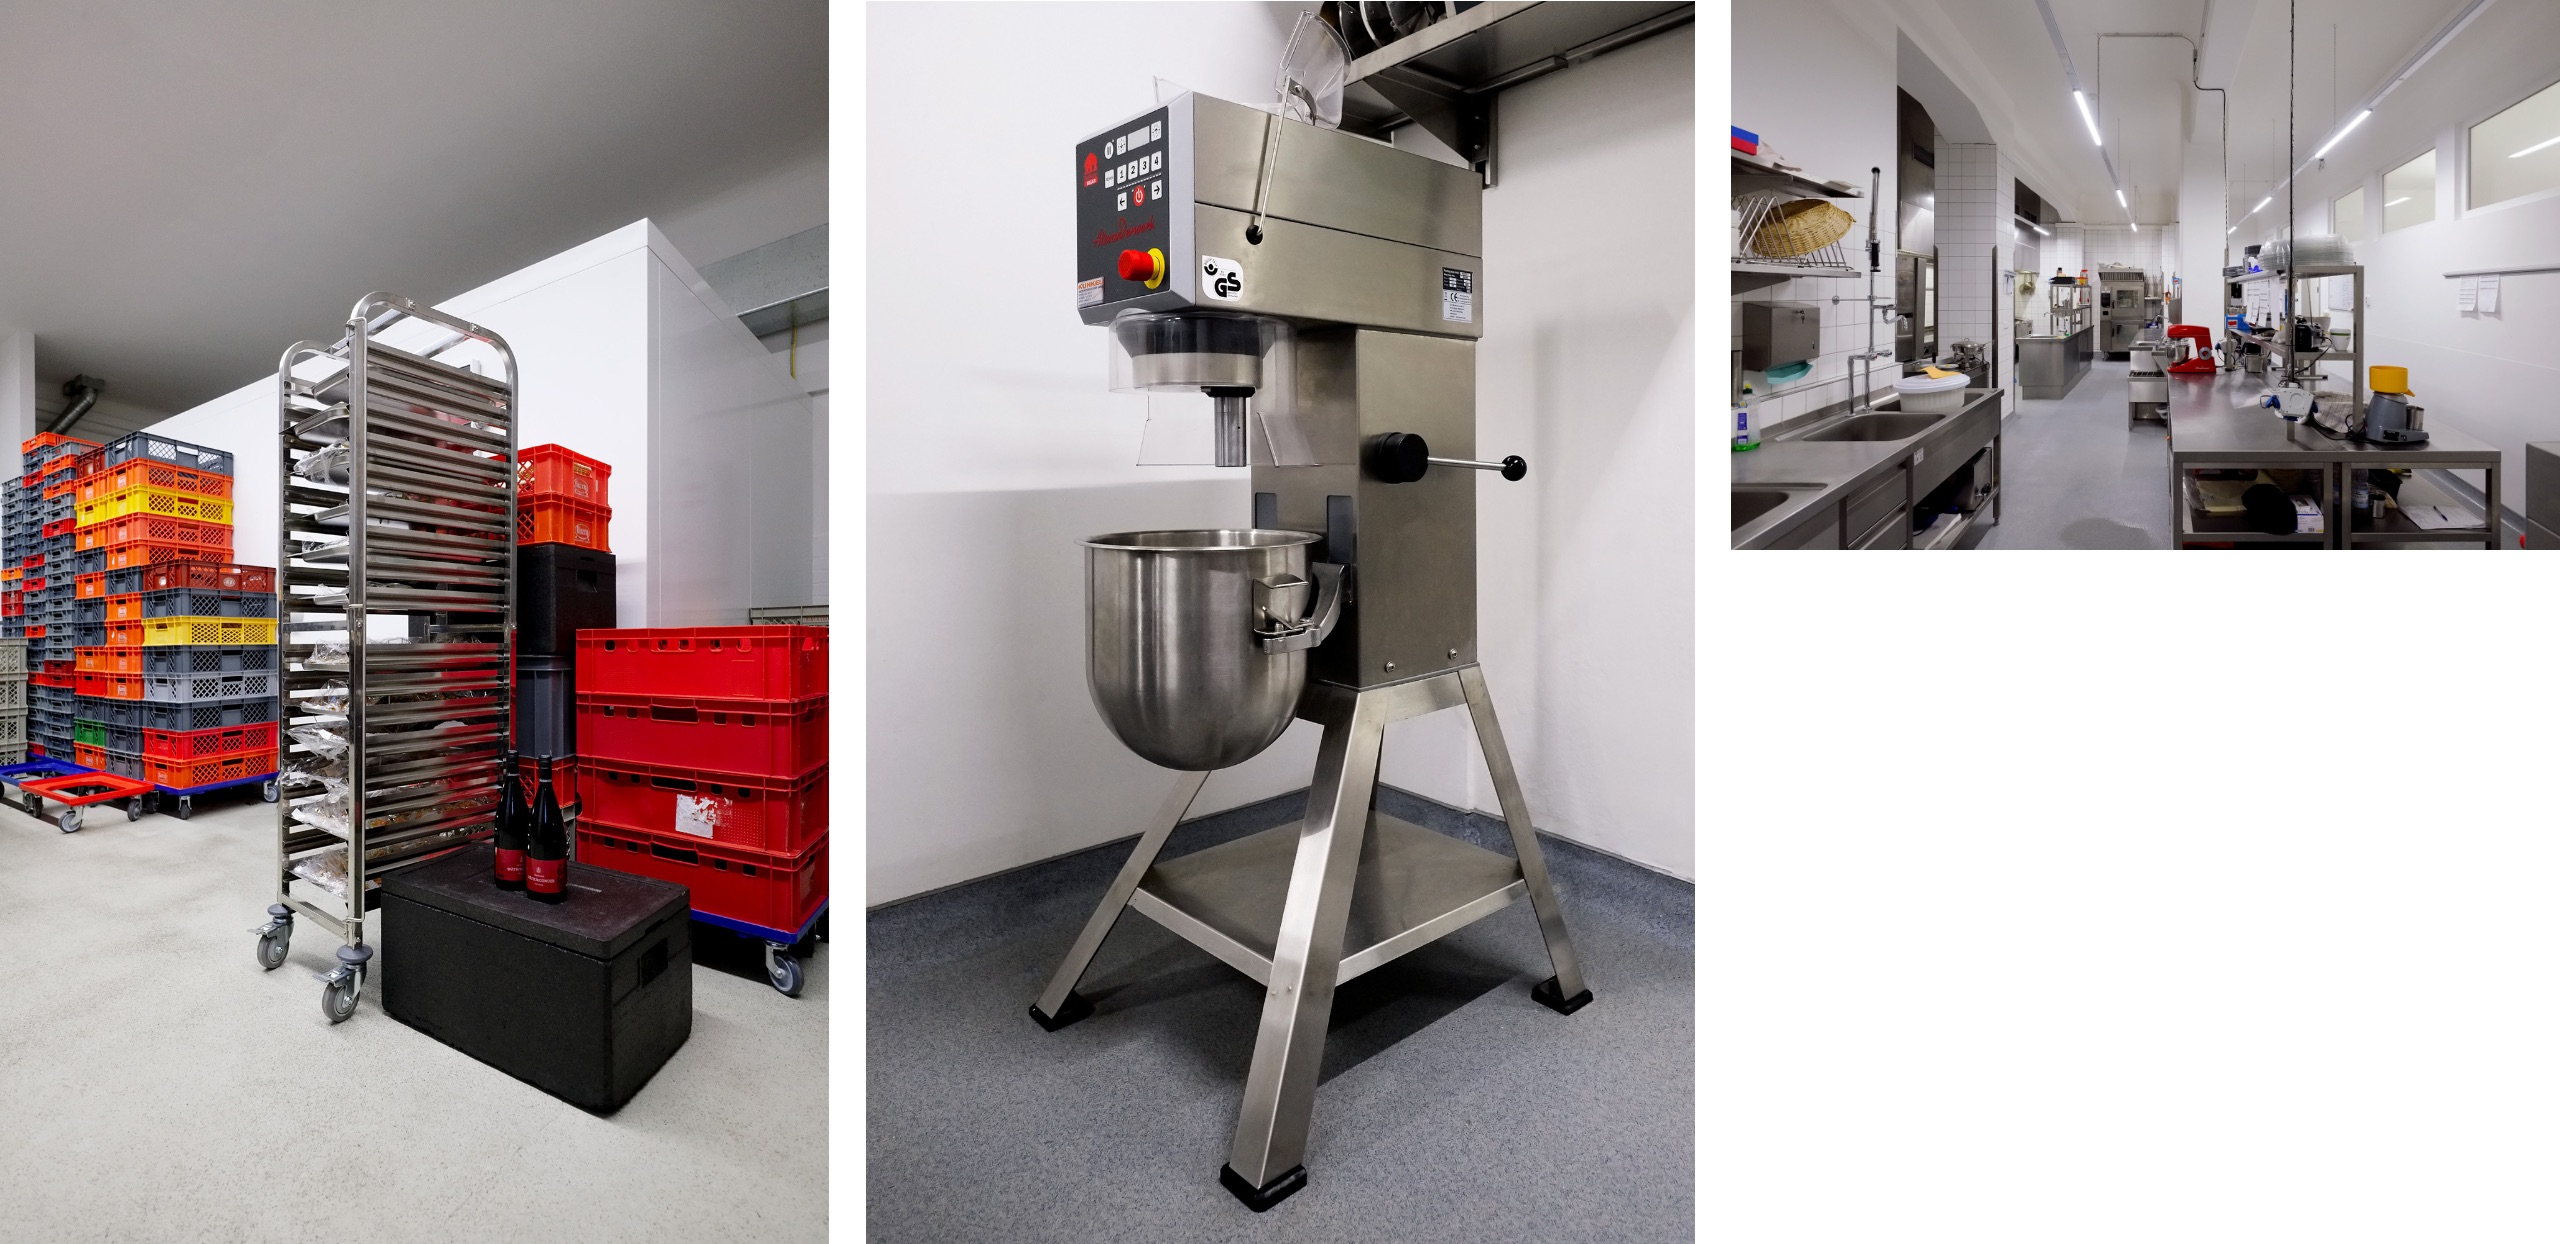 Butterstulle kitchen equipment